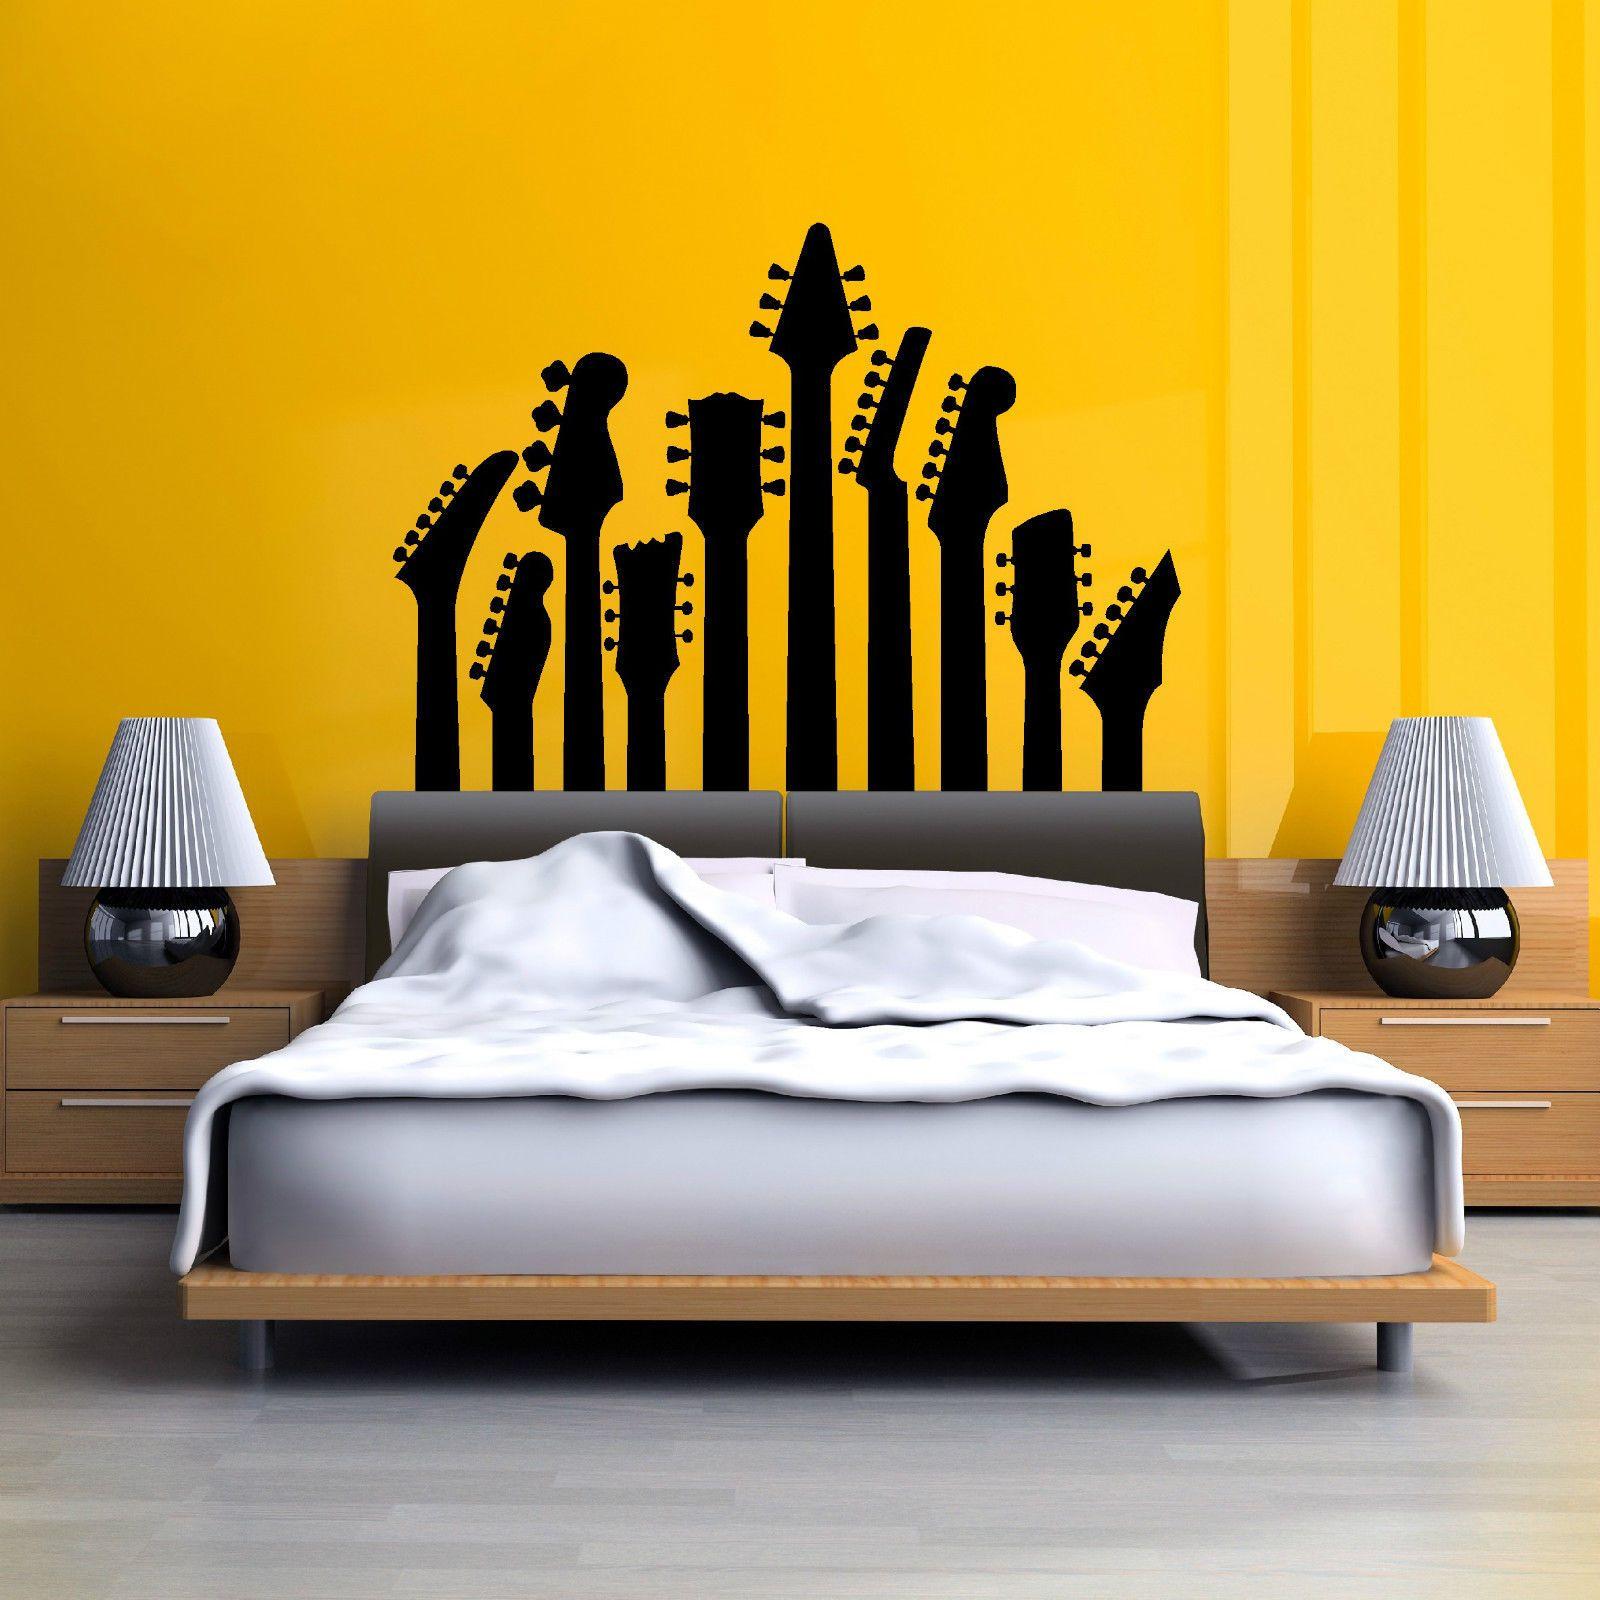 cat kamar tidur anak laki laki kuning kamar tidur anak on wall stickers stiker kamar tidur remaja id=31006